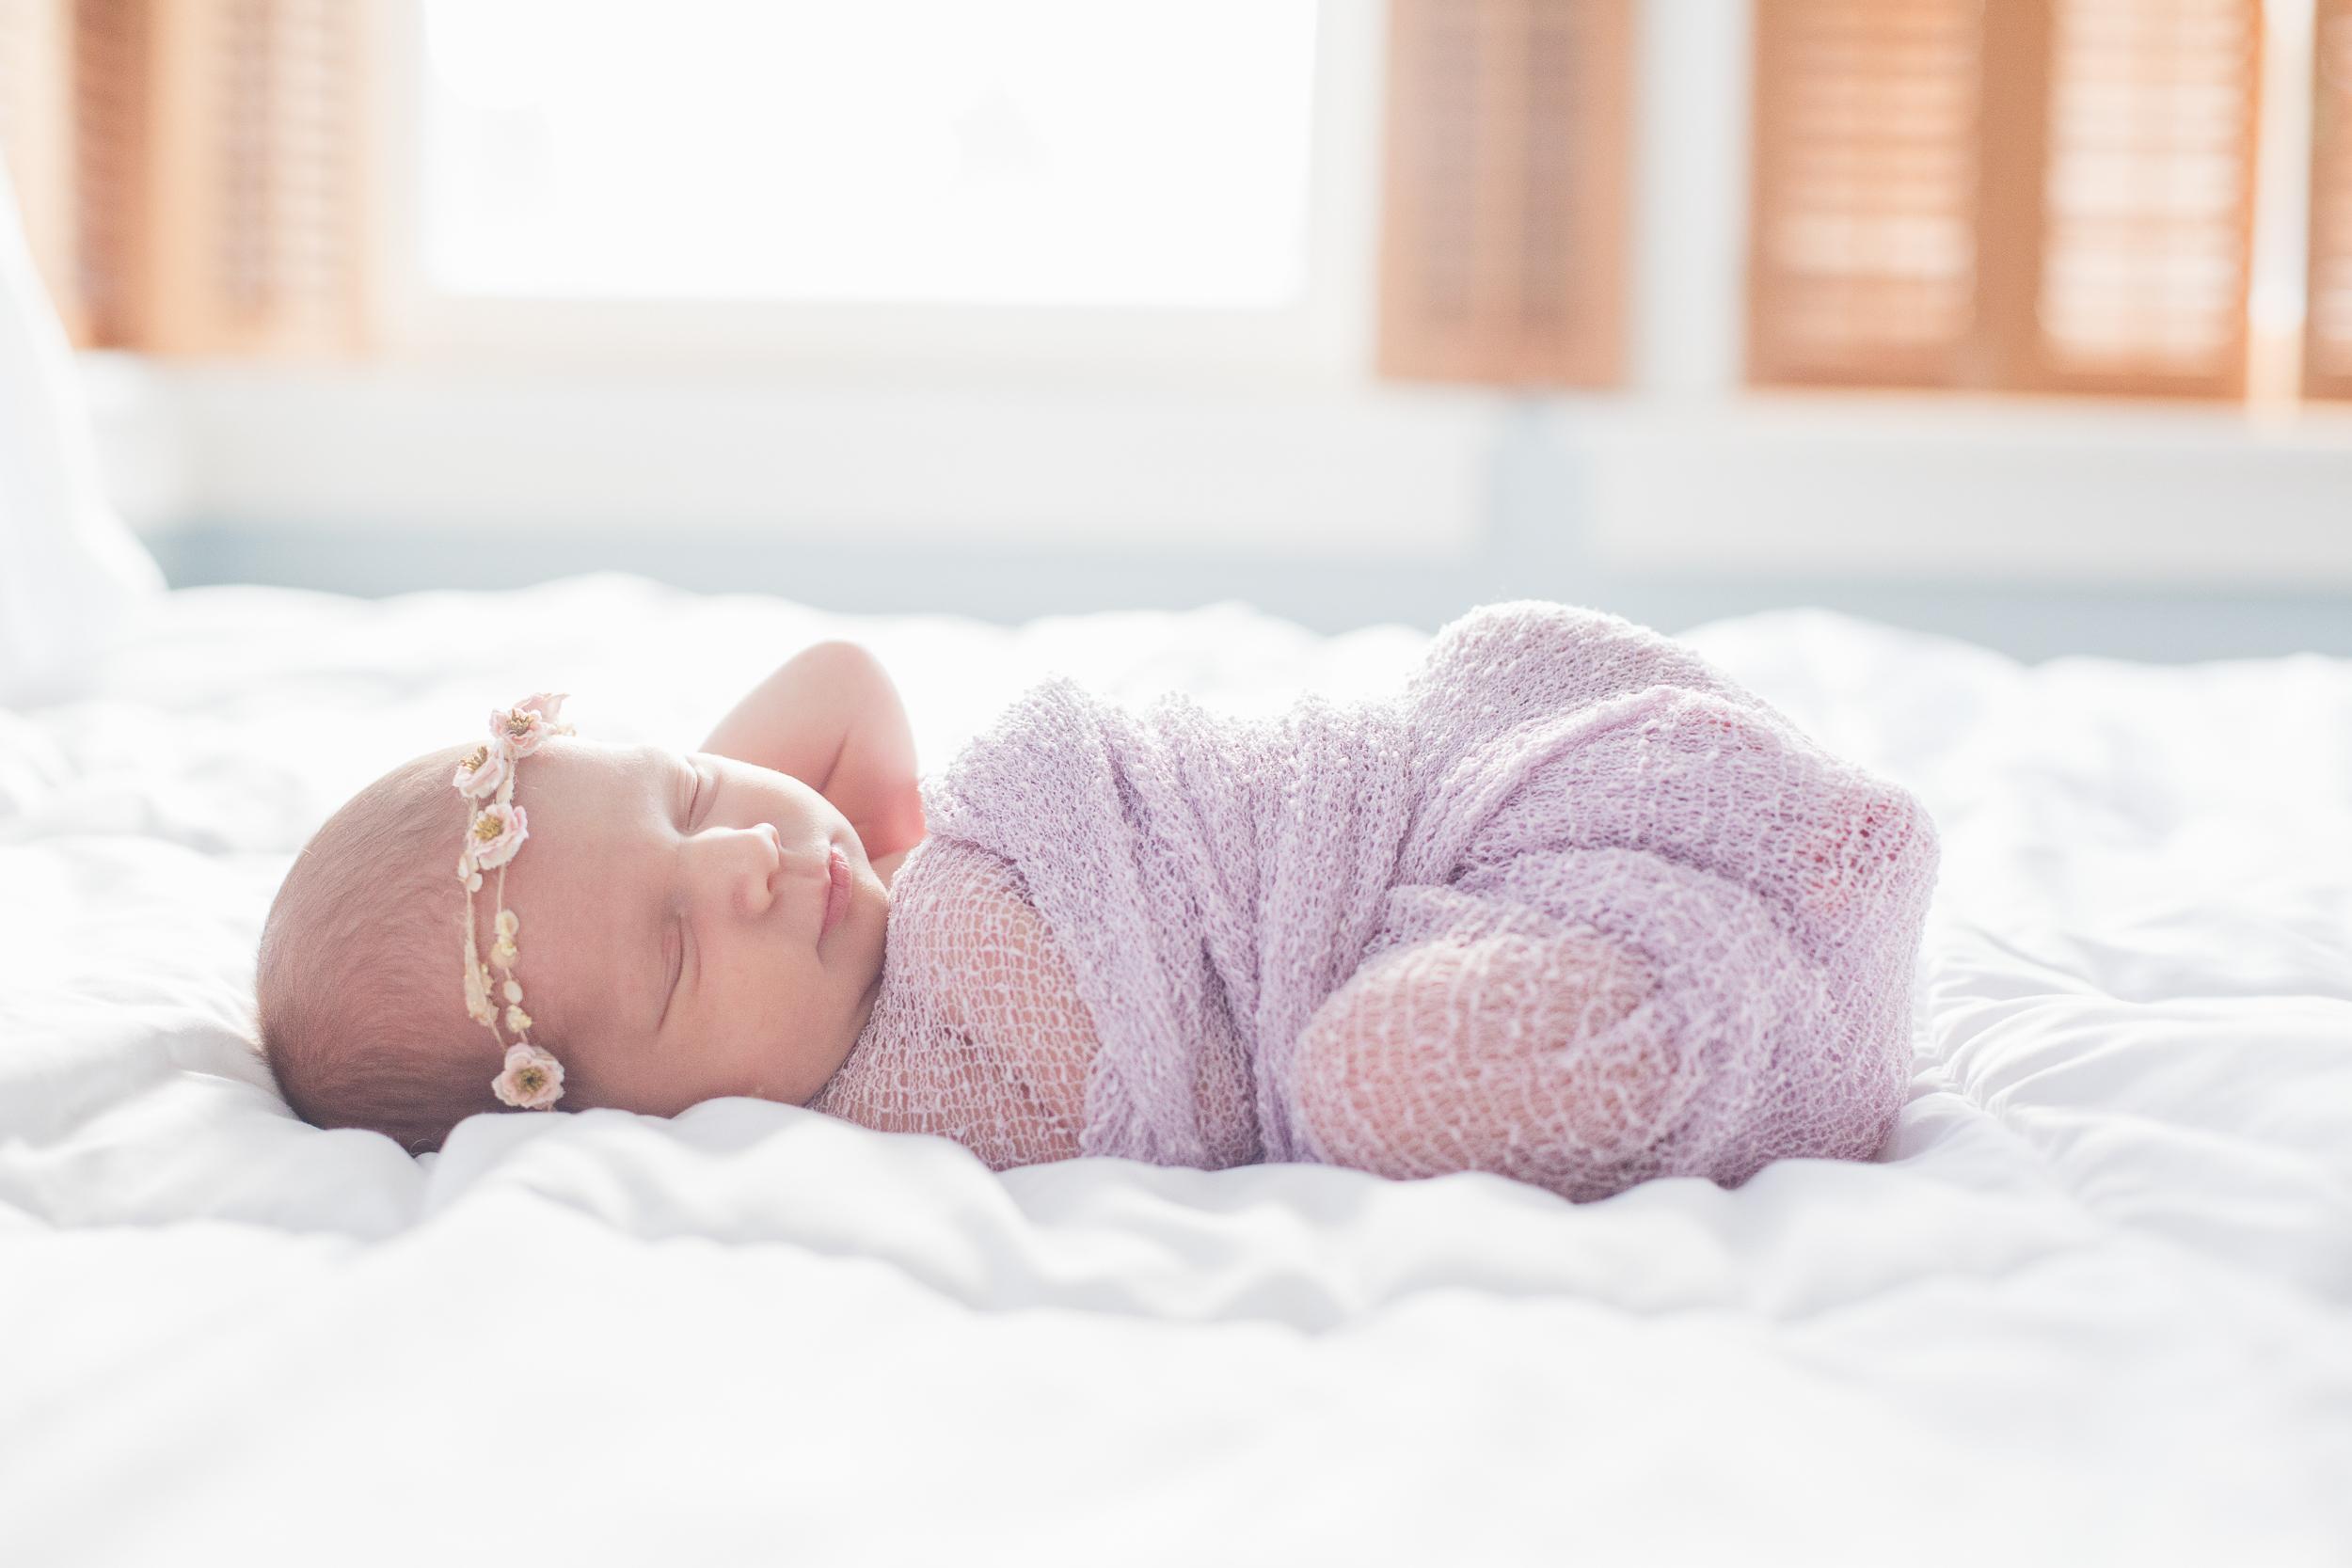 Rochester_NY_Lifestyle_Newborn_Photographer-2.jpg